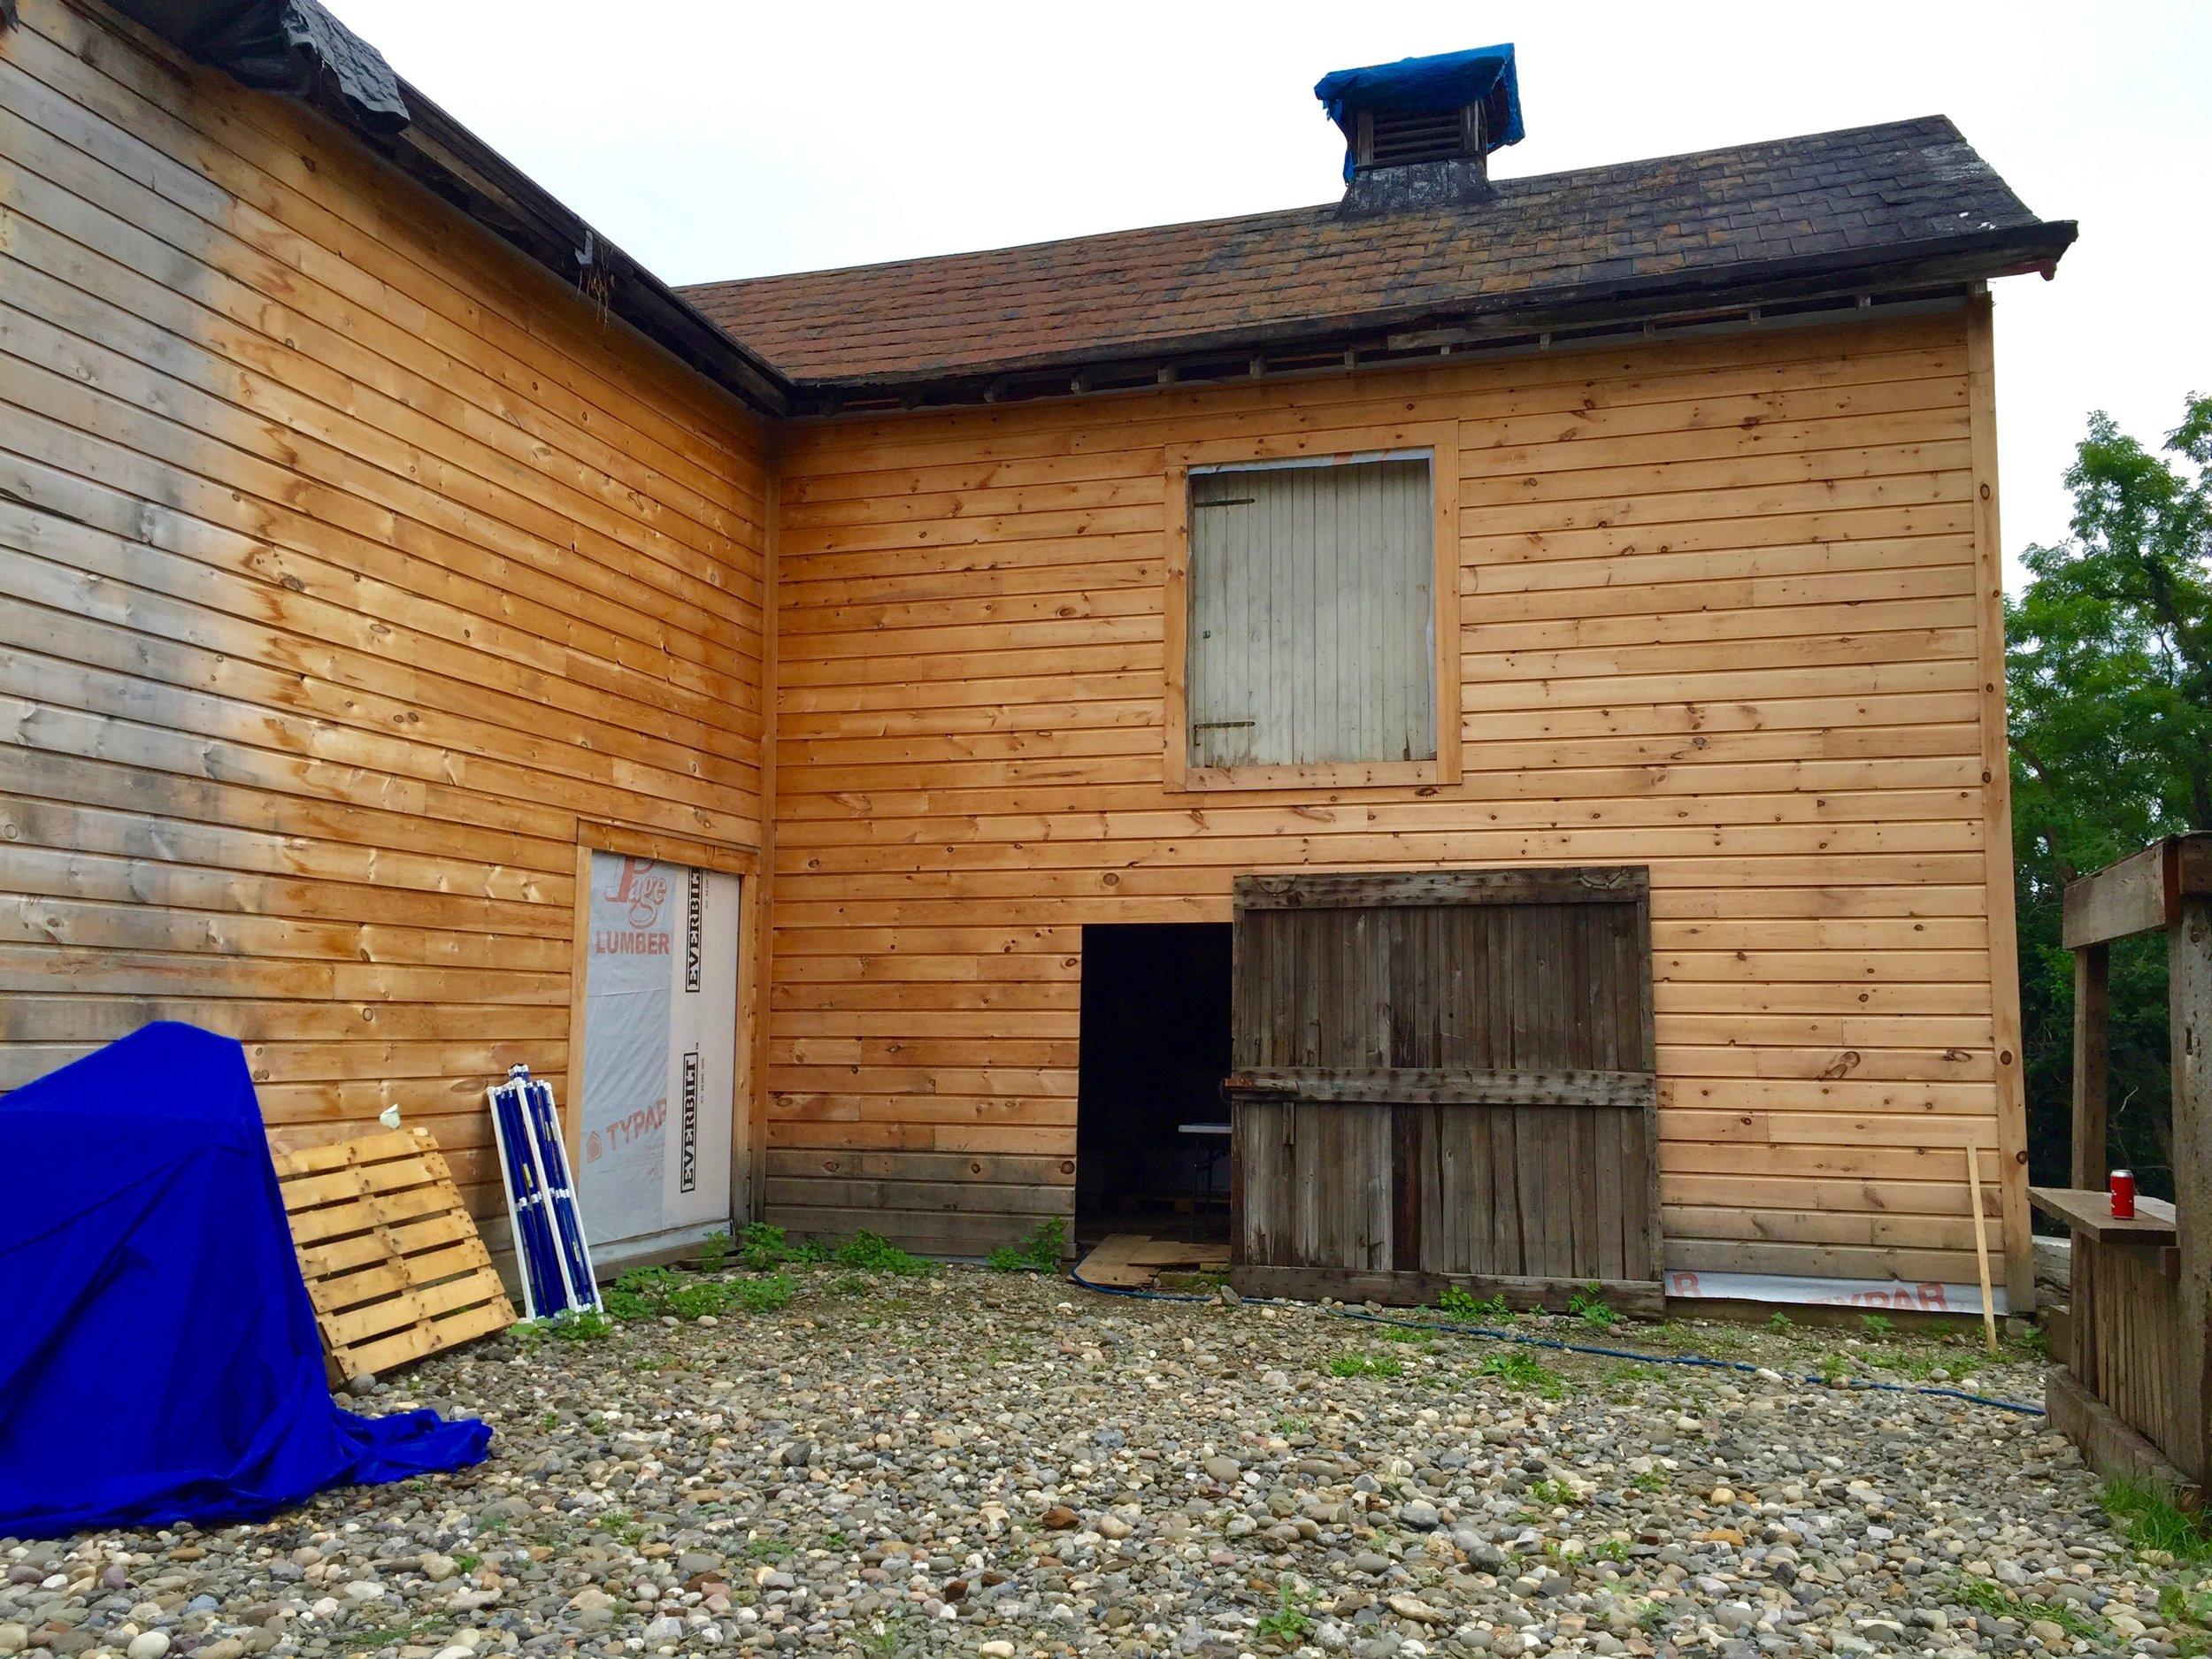 Plan Bee Farm Brewery barn